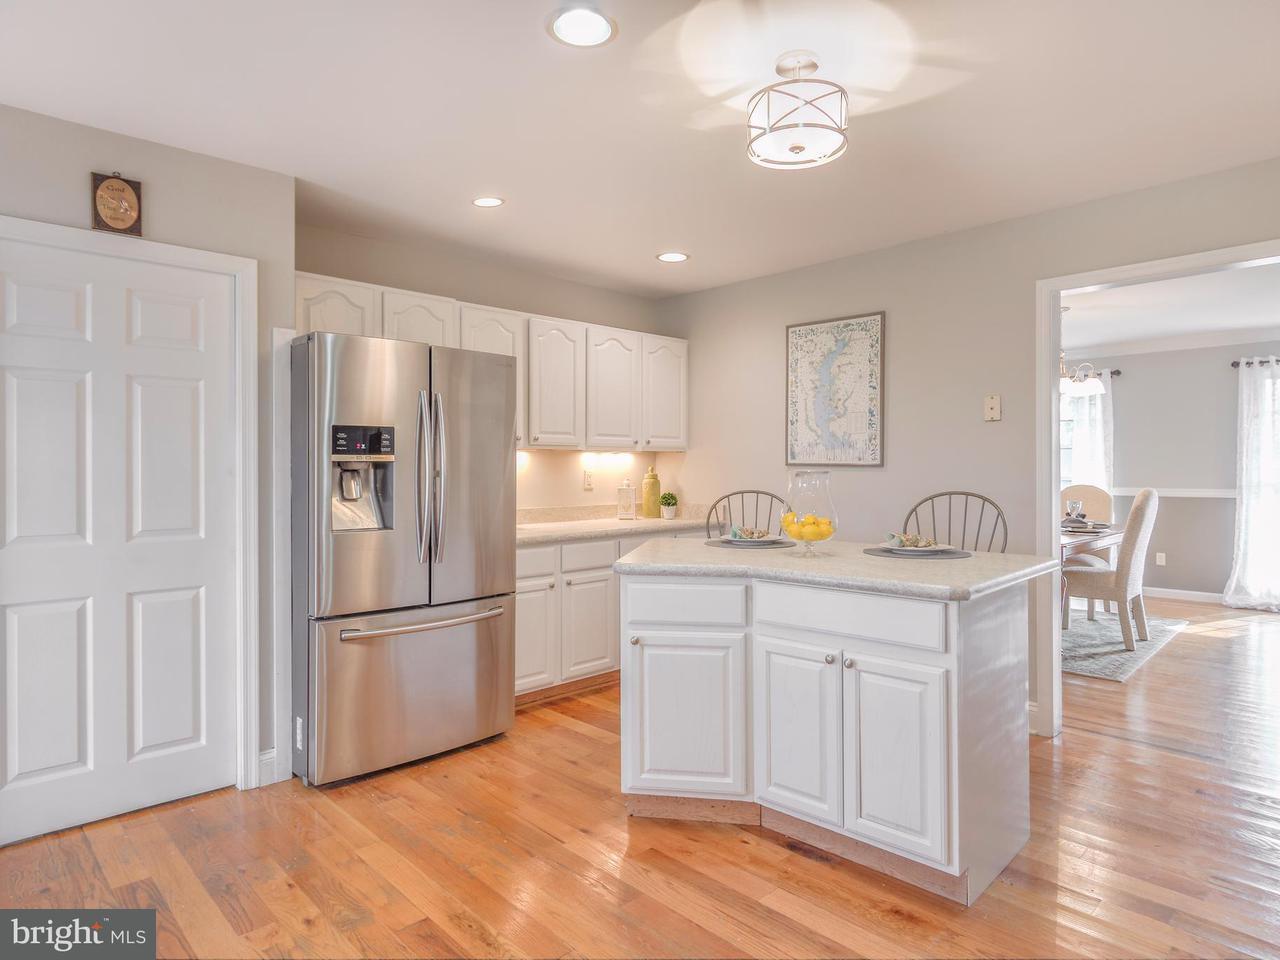 Additional photo for property listing at 761 Pondtown Road 761 Pondtown Road Sudlersville, Maryland 21668 Estados Unidos